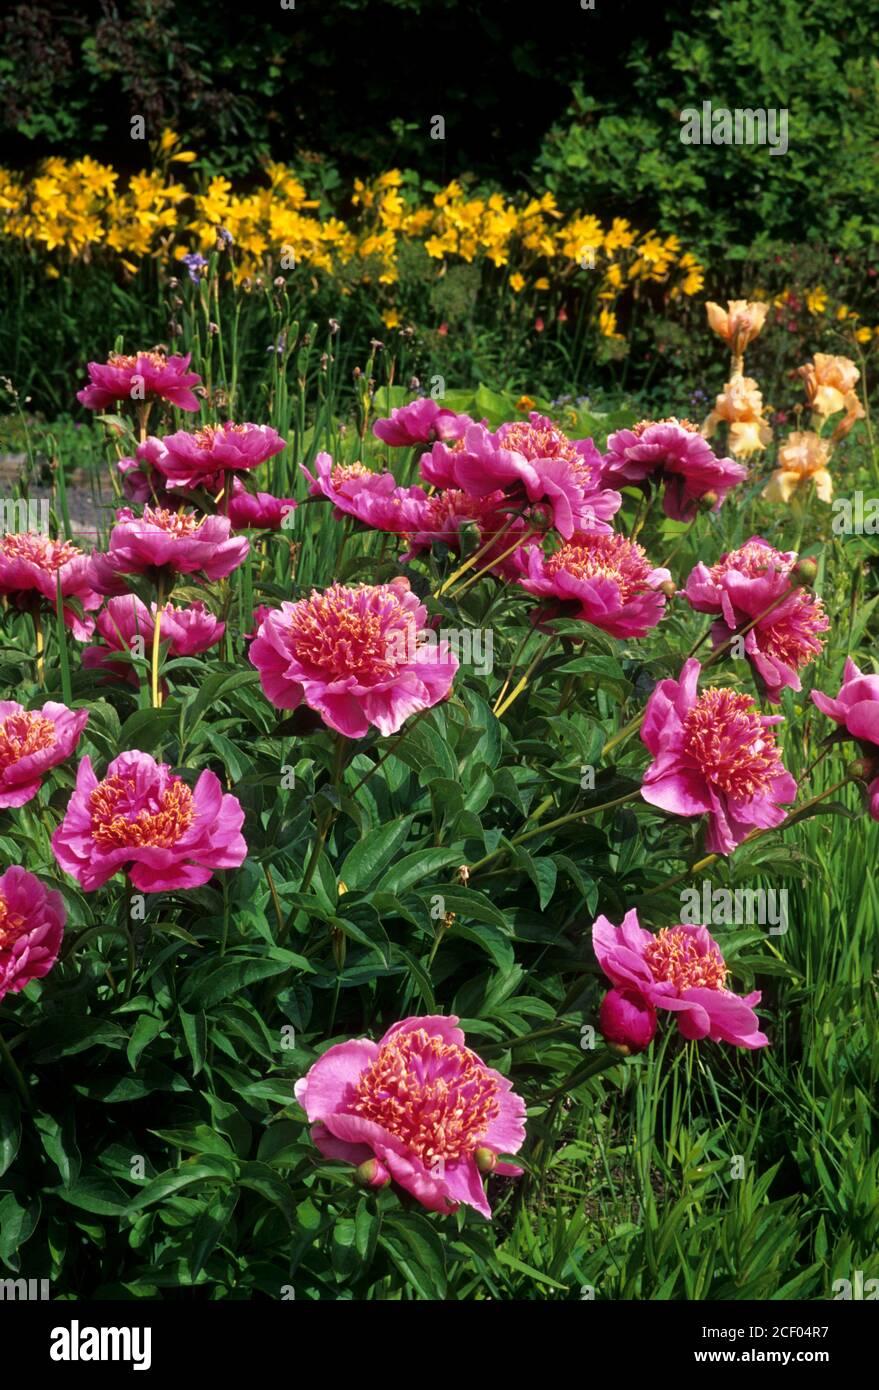 Flower garden, Lawson Gardens, Pullman, Washington Stock Photo